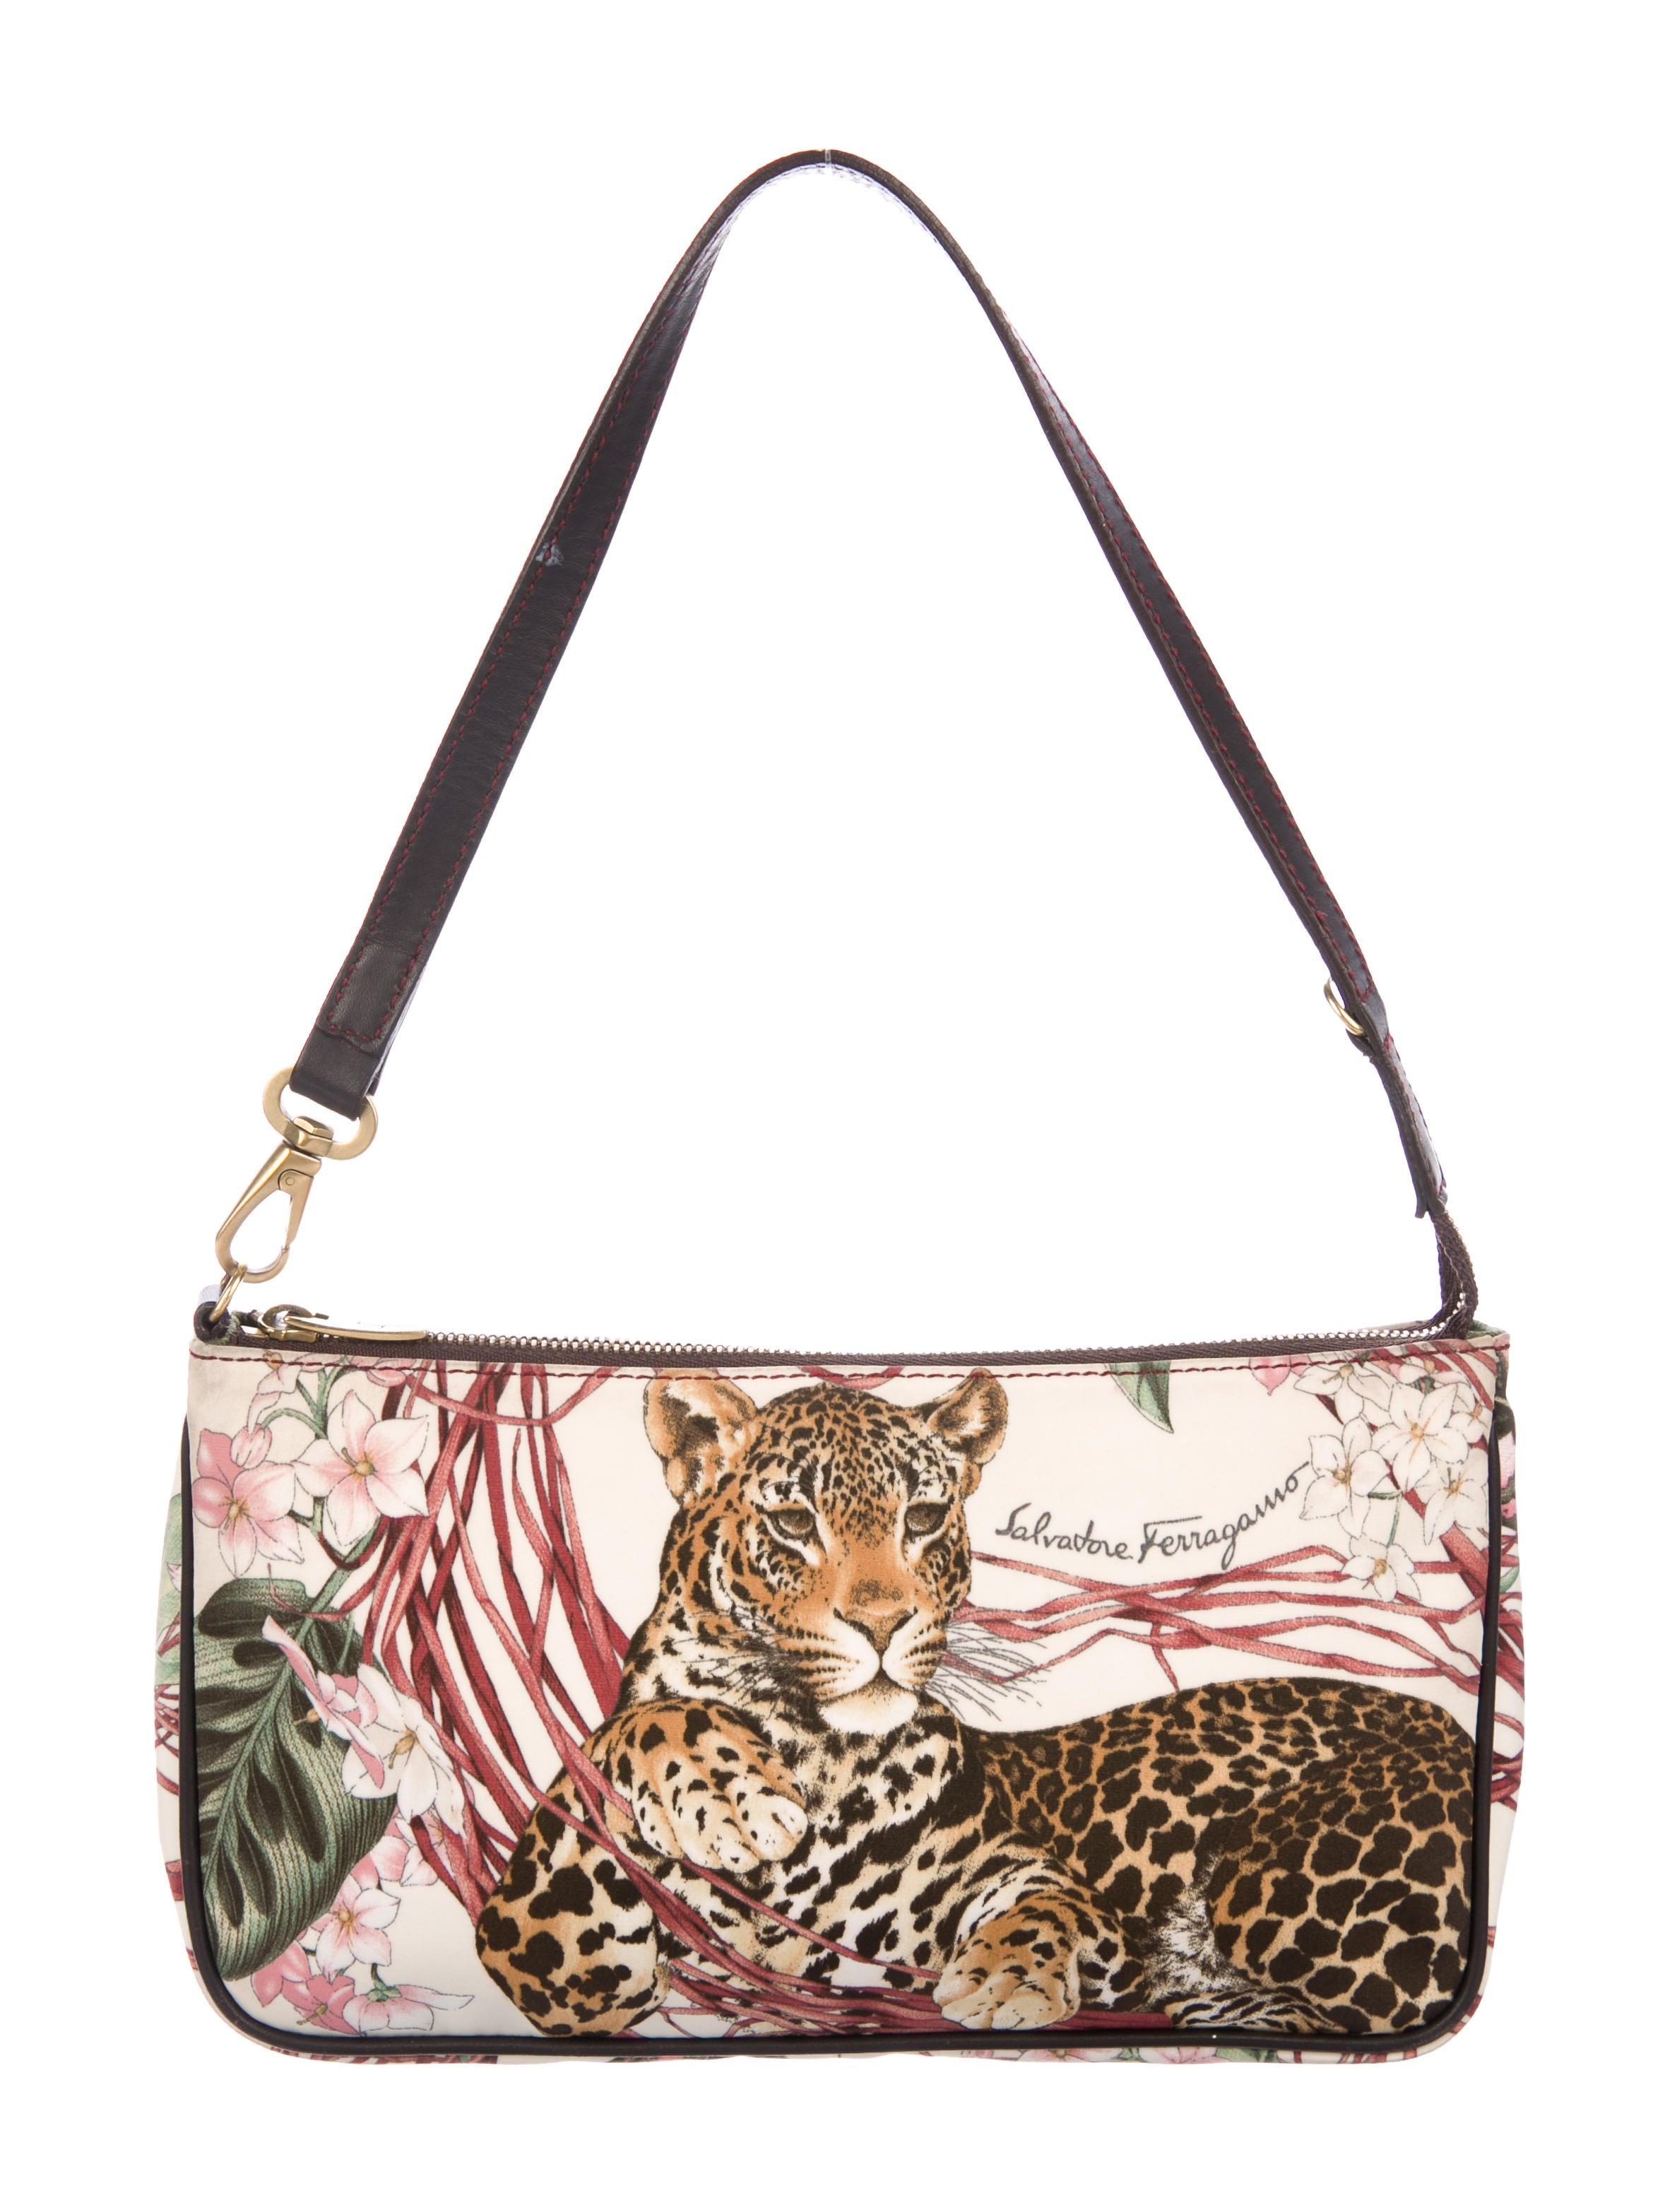 bed7ccef56be Salvatore Ferragamo Leather-Trimmed Jaguar Pochette - Handbags ...